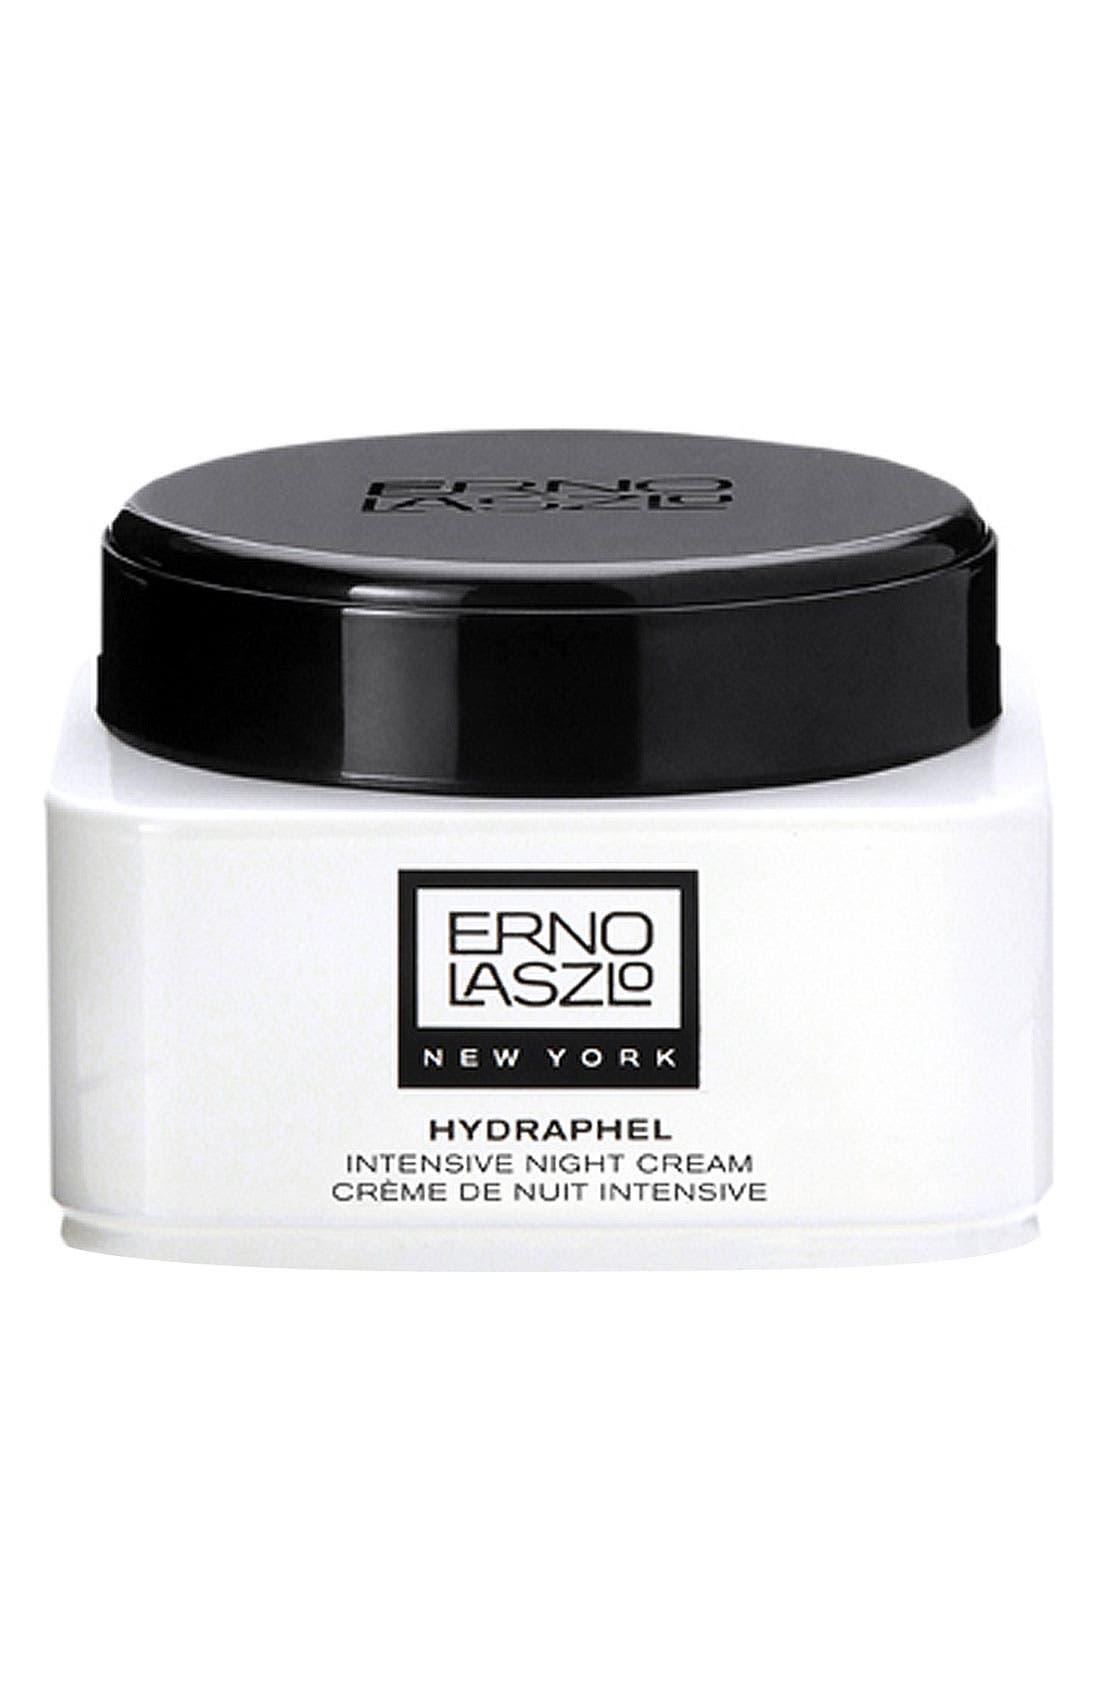 Erno Laszlo 'Hydraphel' Intensive Night Cream